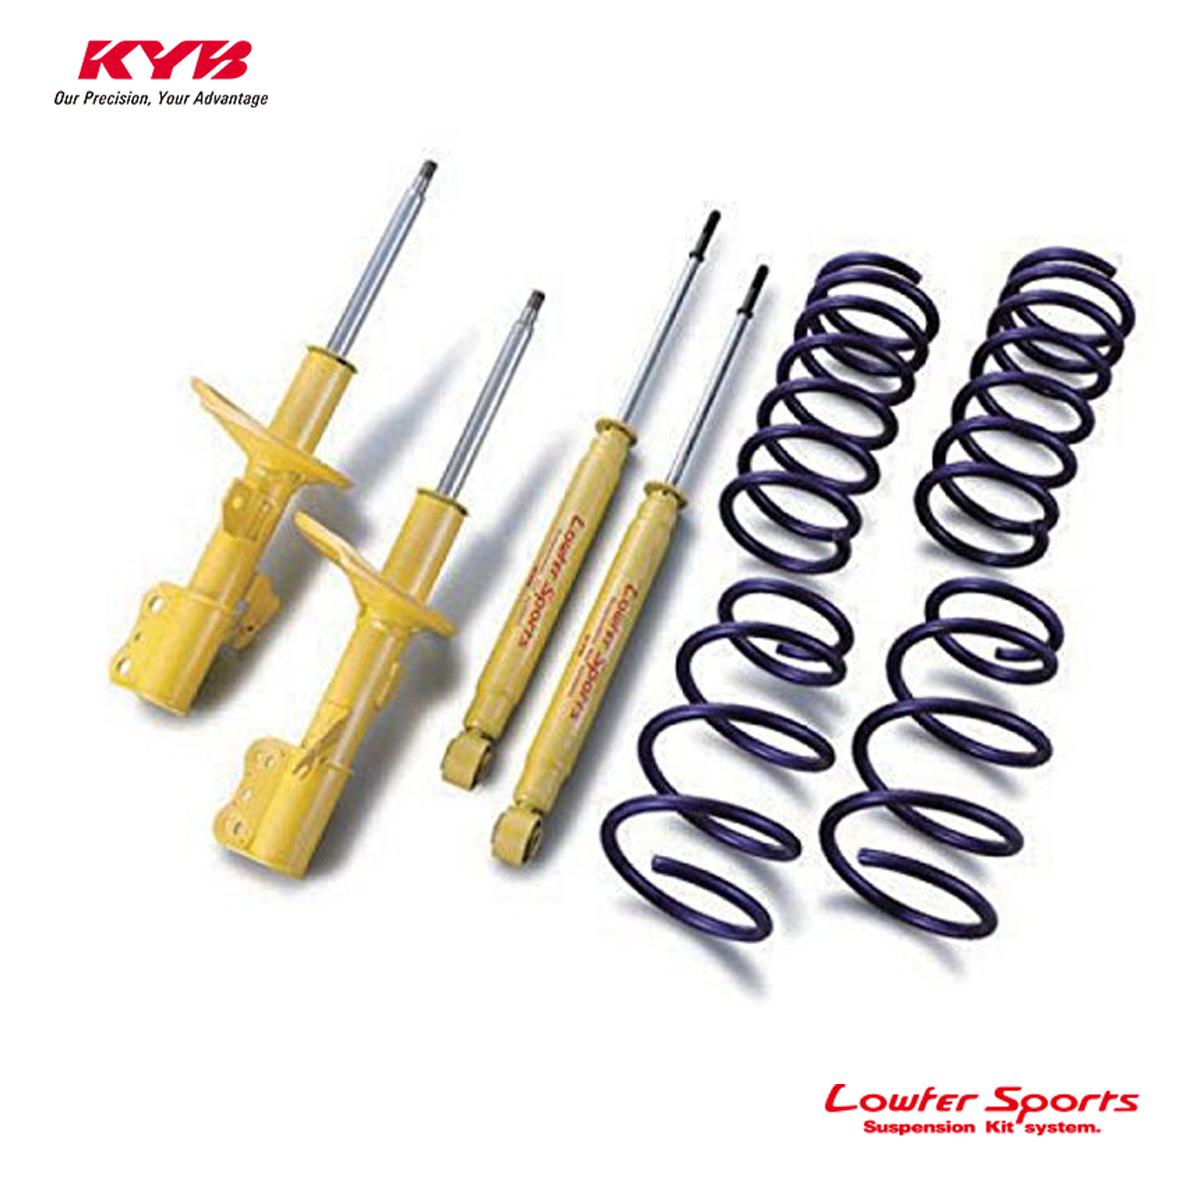 KYB カヤバ MPV LW5W ショックアブソーバー サスペンションキット 1台分 ローファースポーツ キット Lowfer Sports LKIT-LW5W